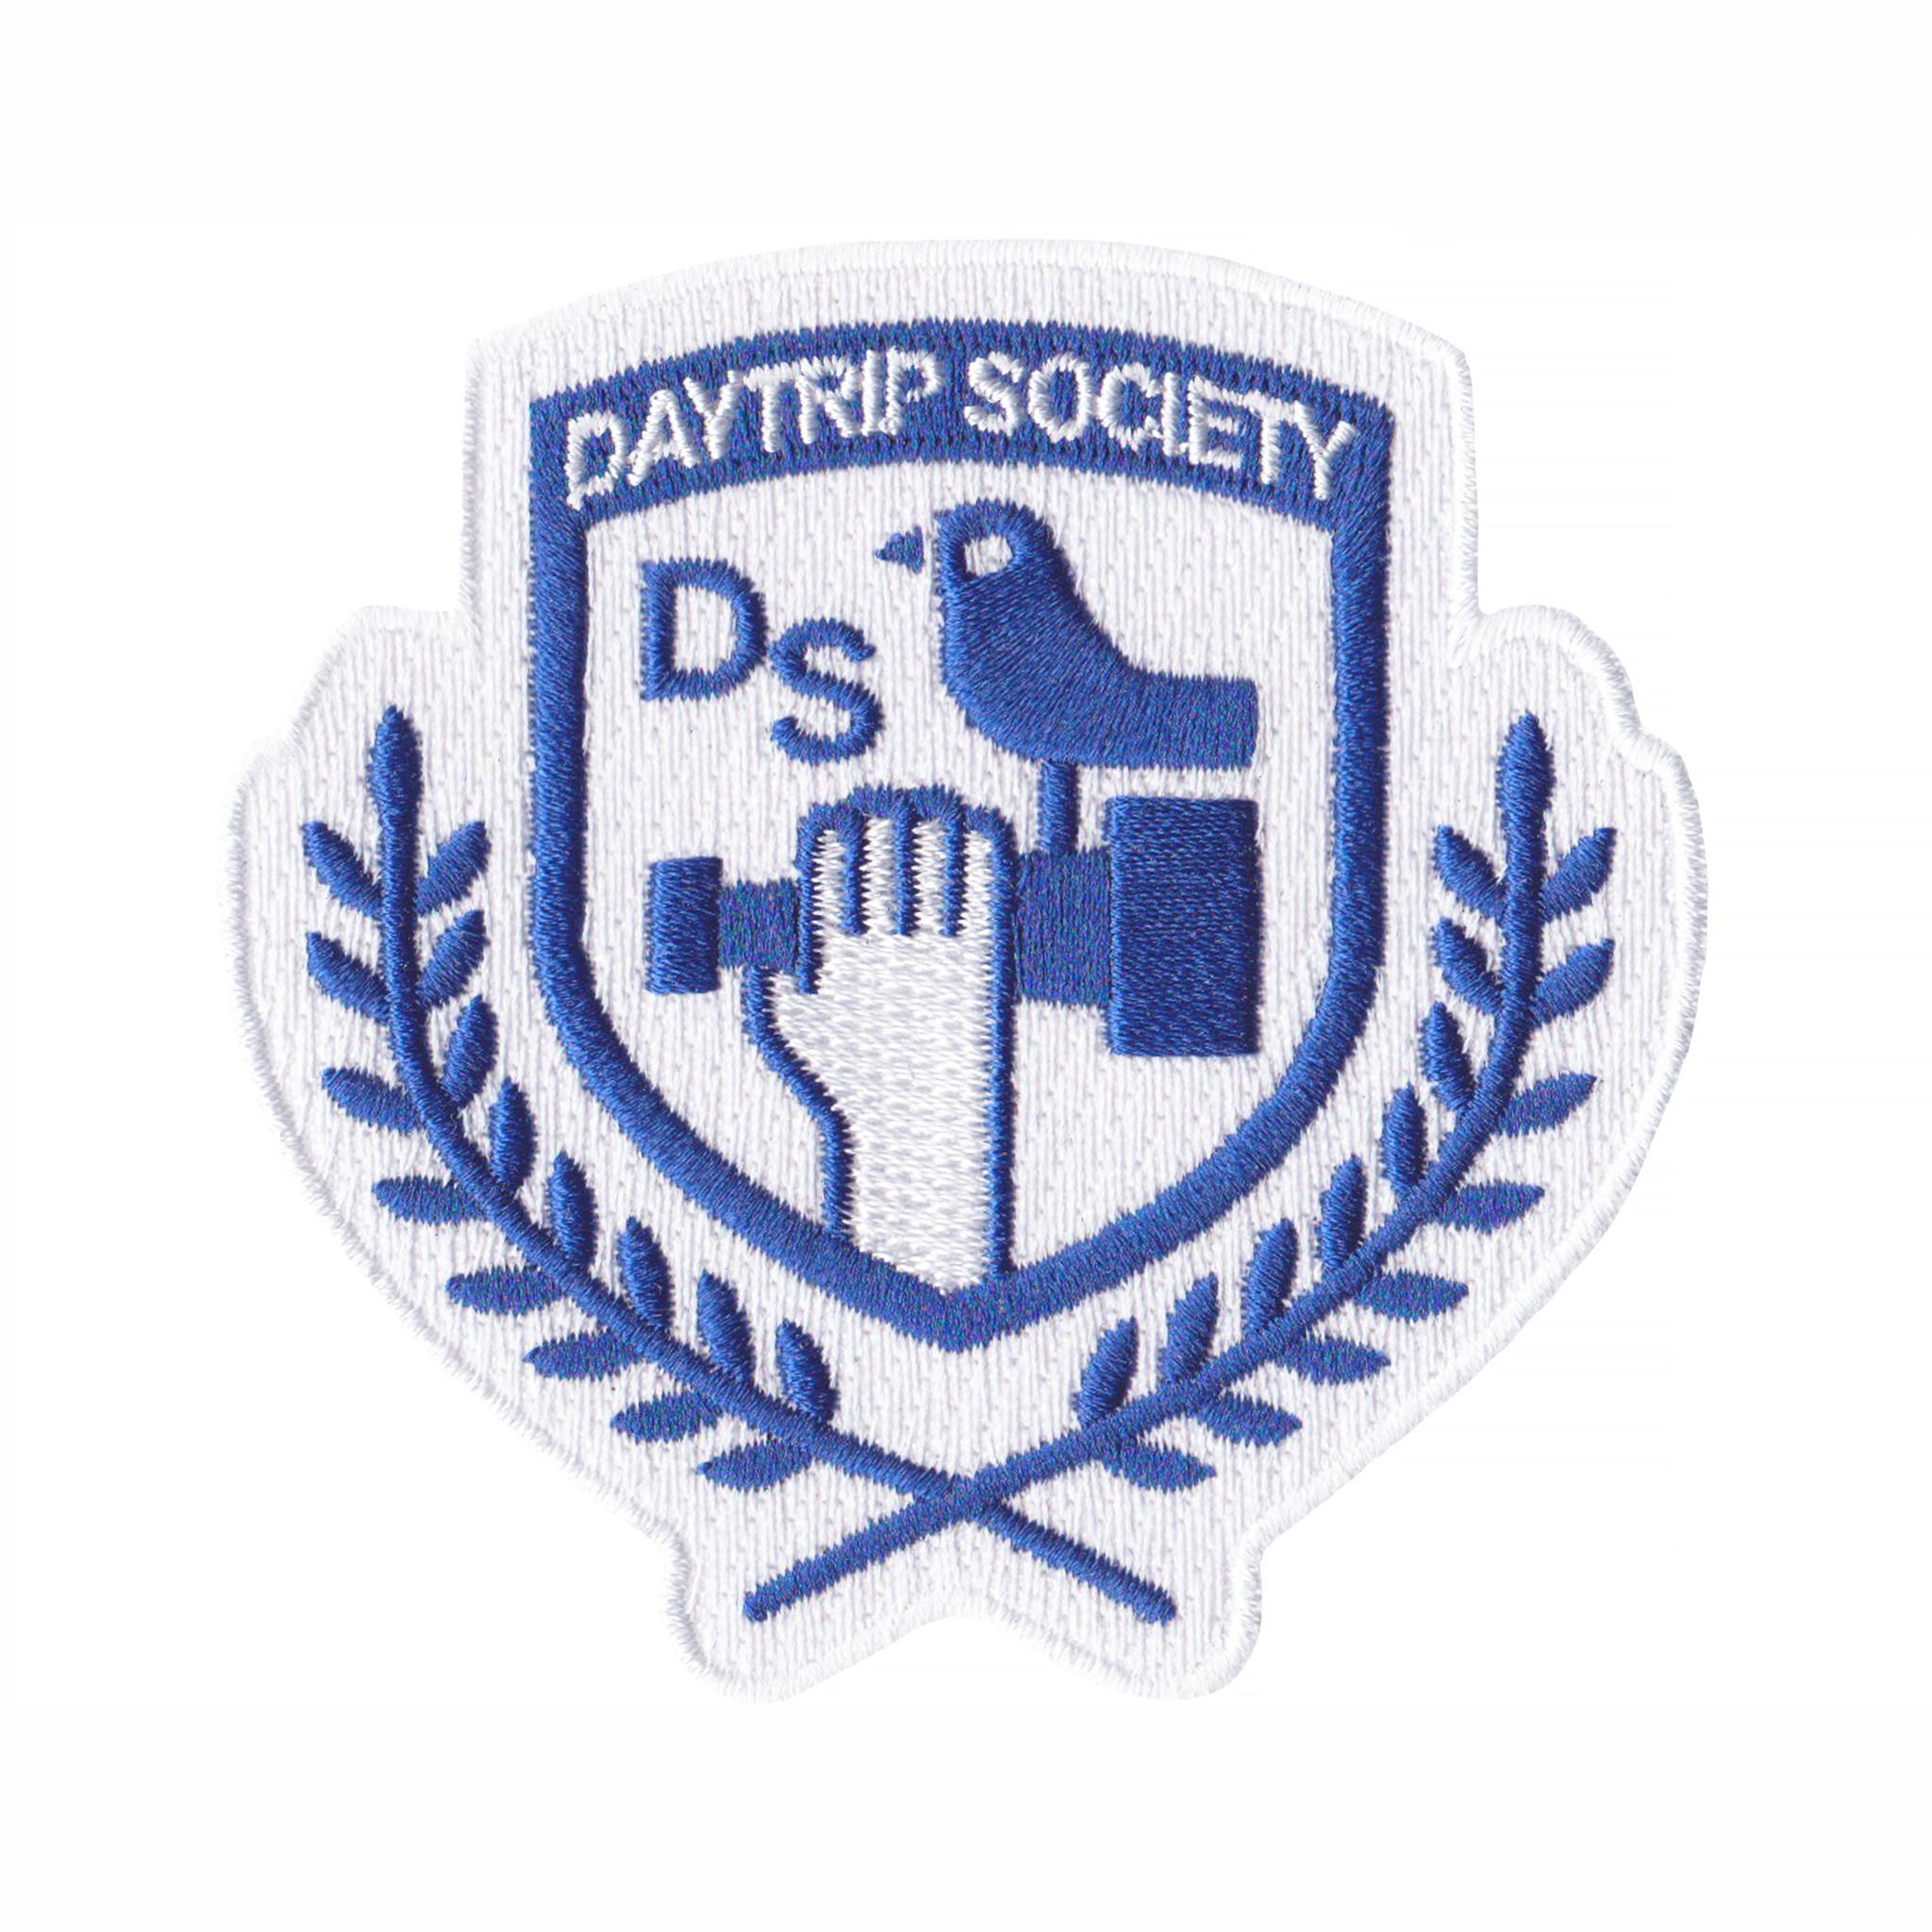 Daytrip Society Daytrip Society Crest Iron-On Patch